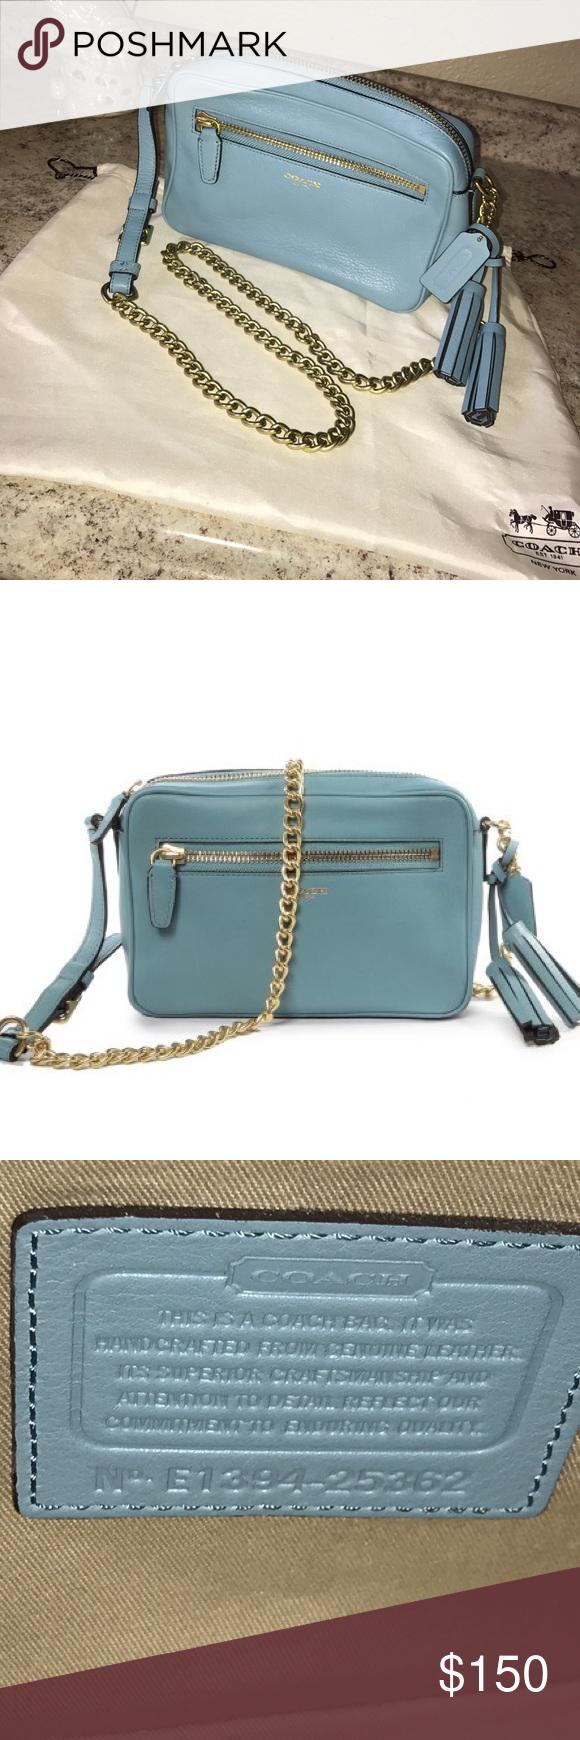 a836e64378 Coach  Legacy  Leather Flight bag 25362  Authentic  Robin egg blue  Tiffany